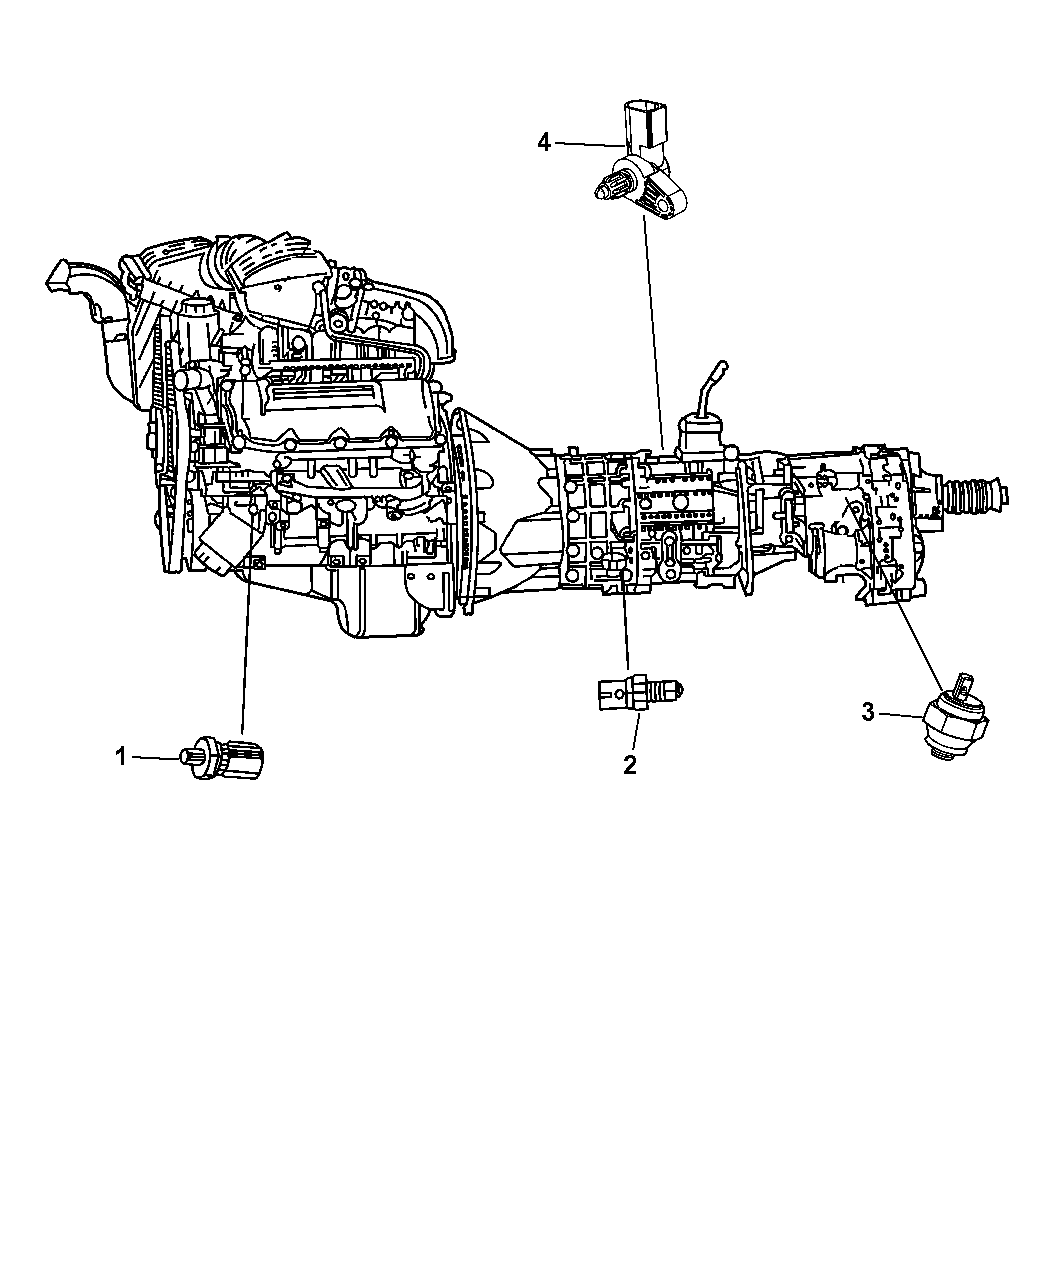 2013 Jeep Wrangler Wiring Schematic